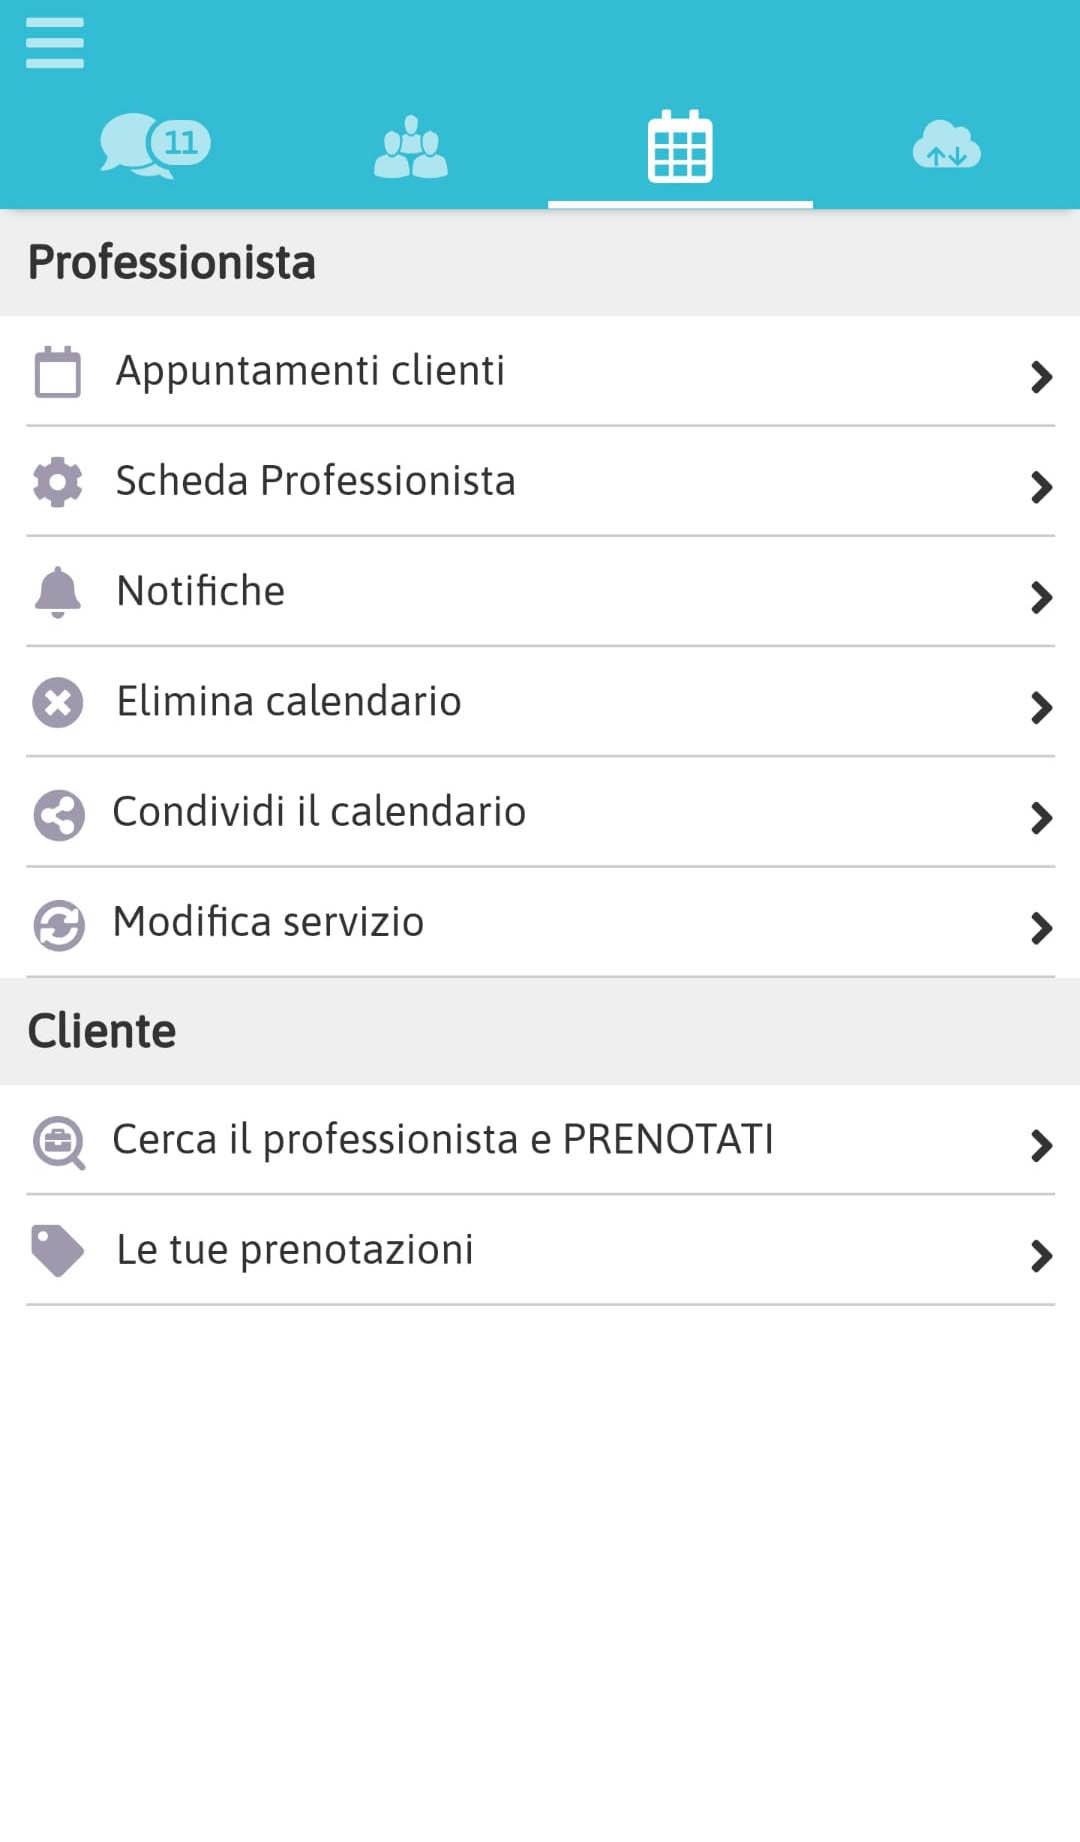 opzioni_professionista